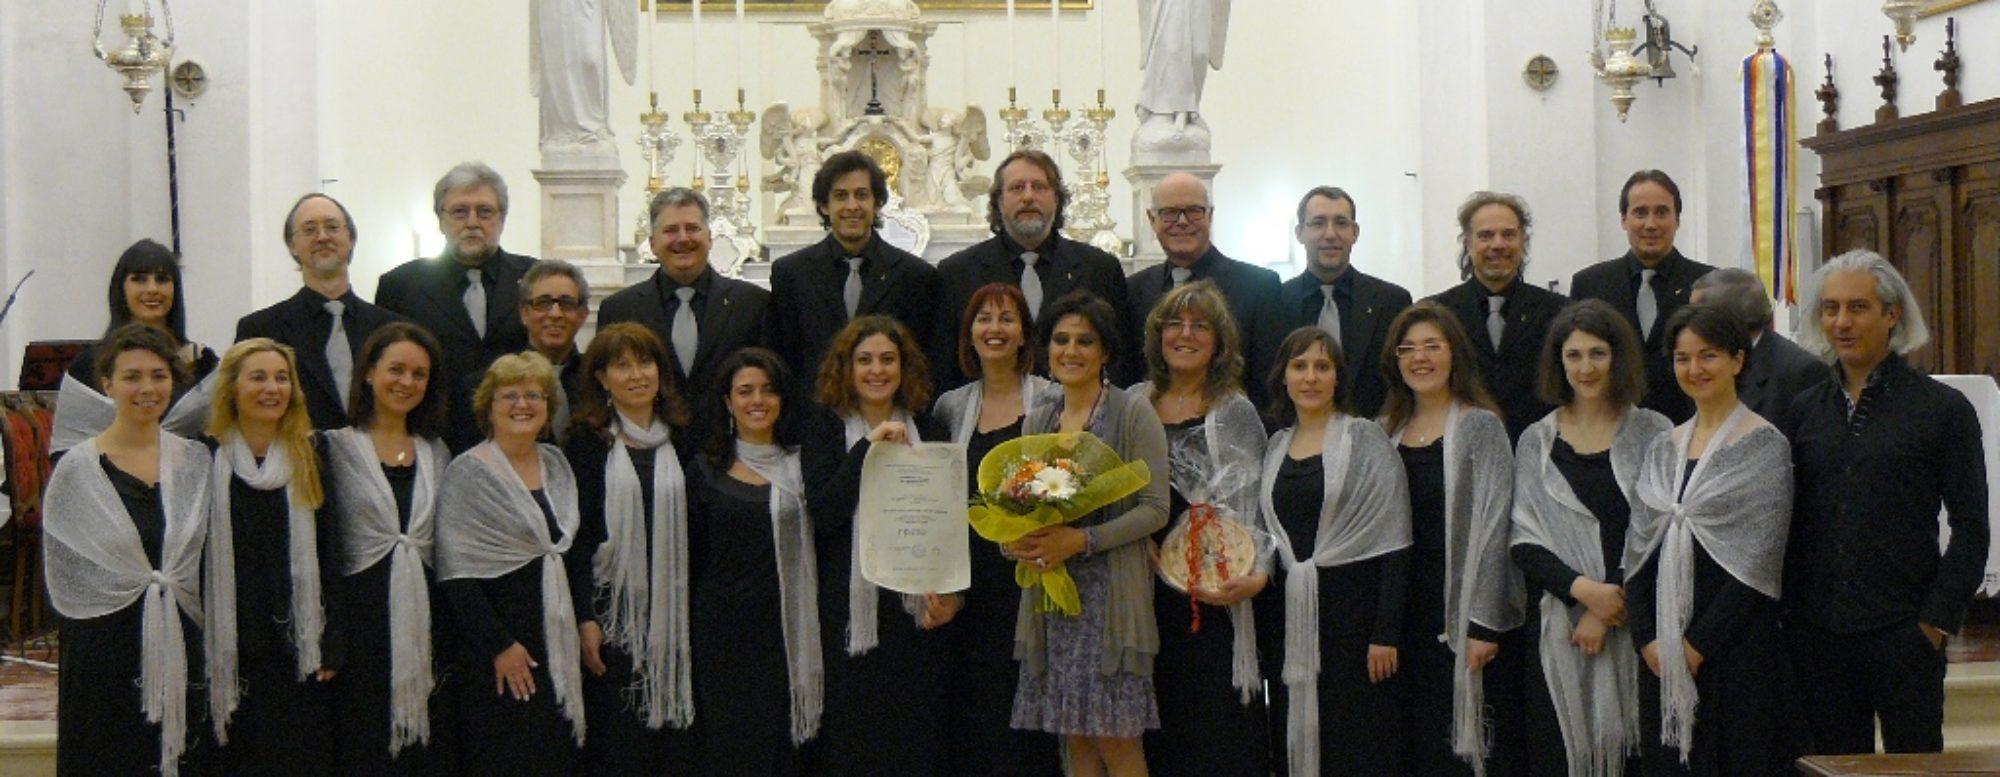 Cappella Tergestina